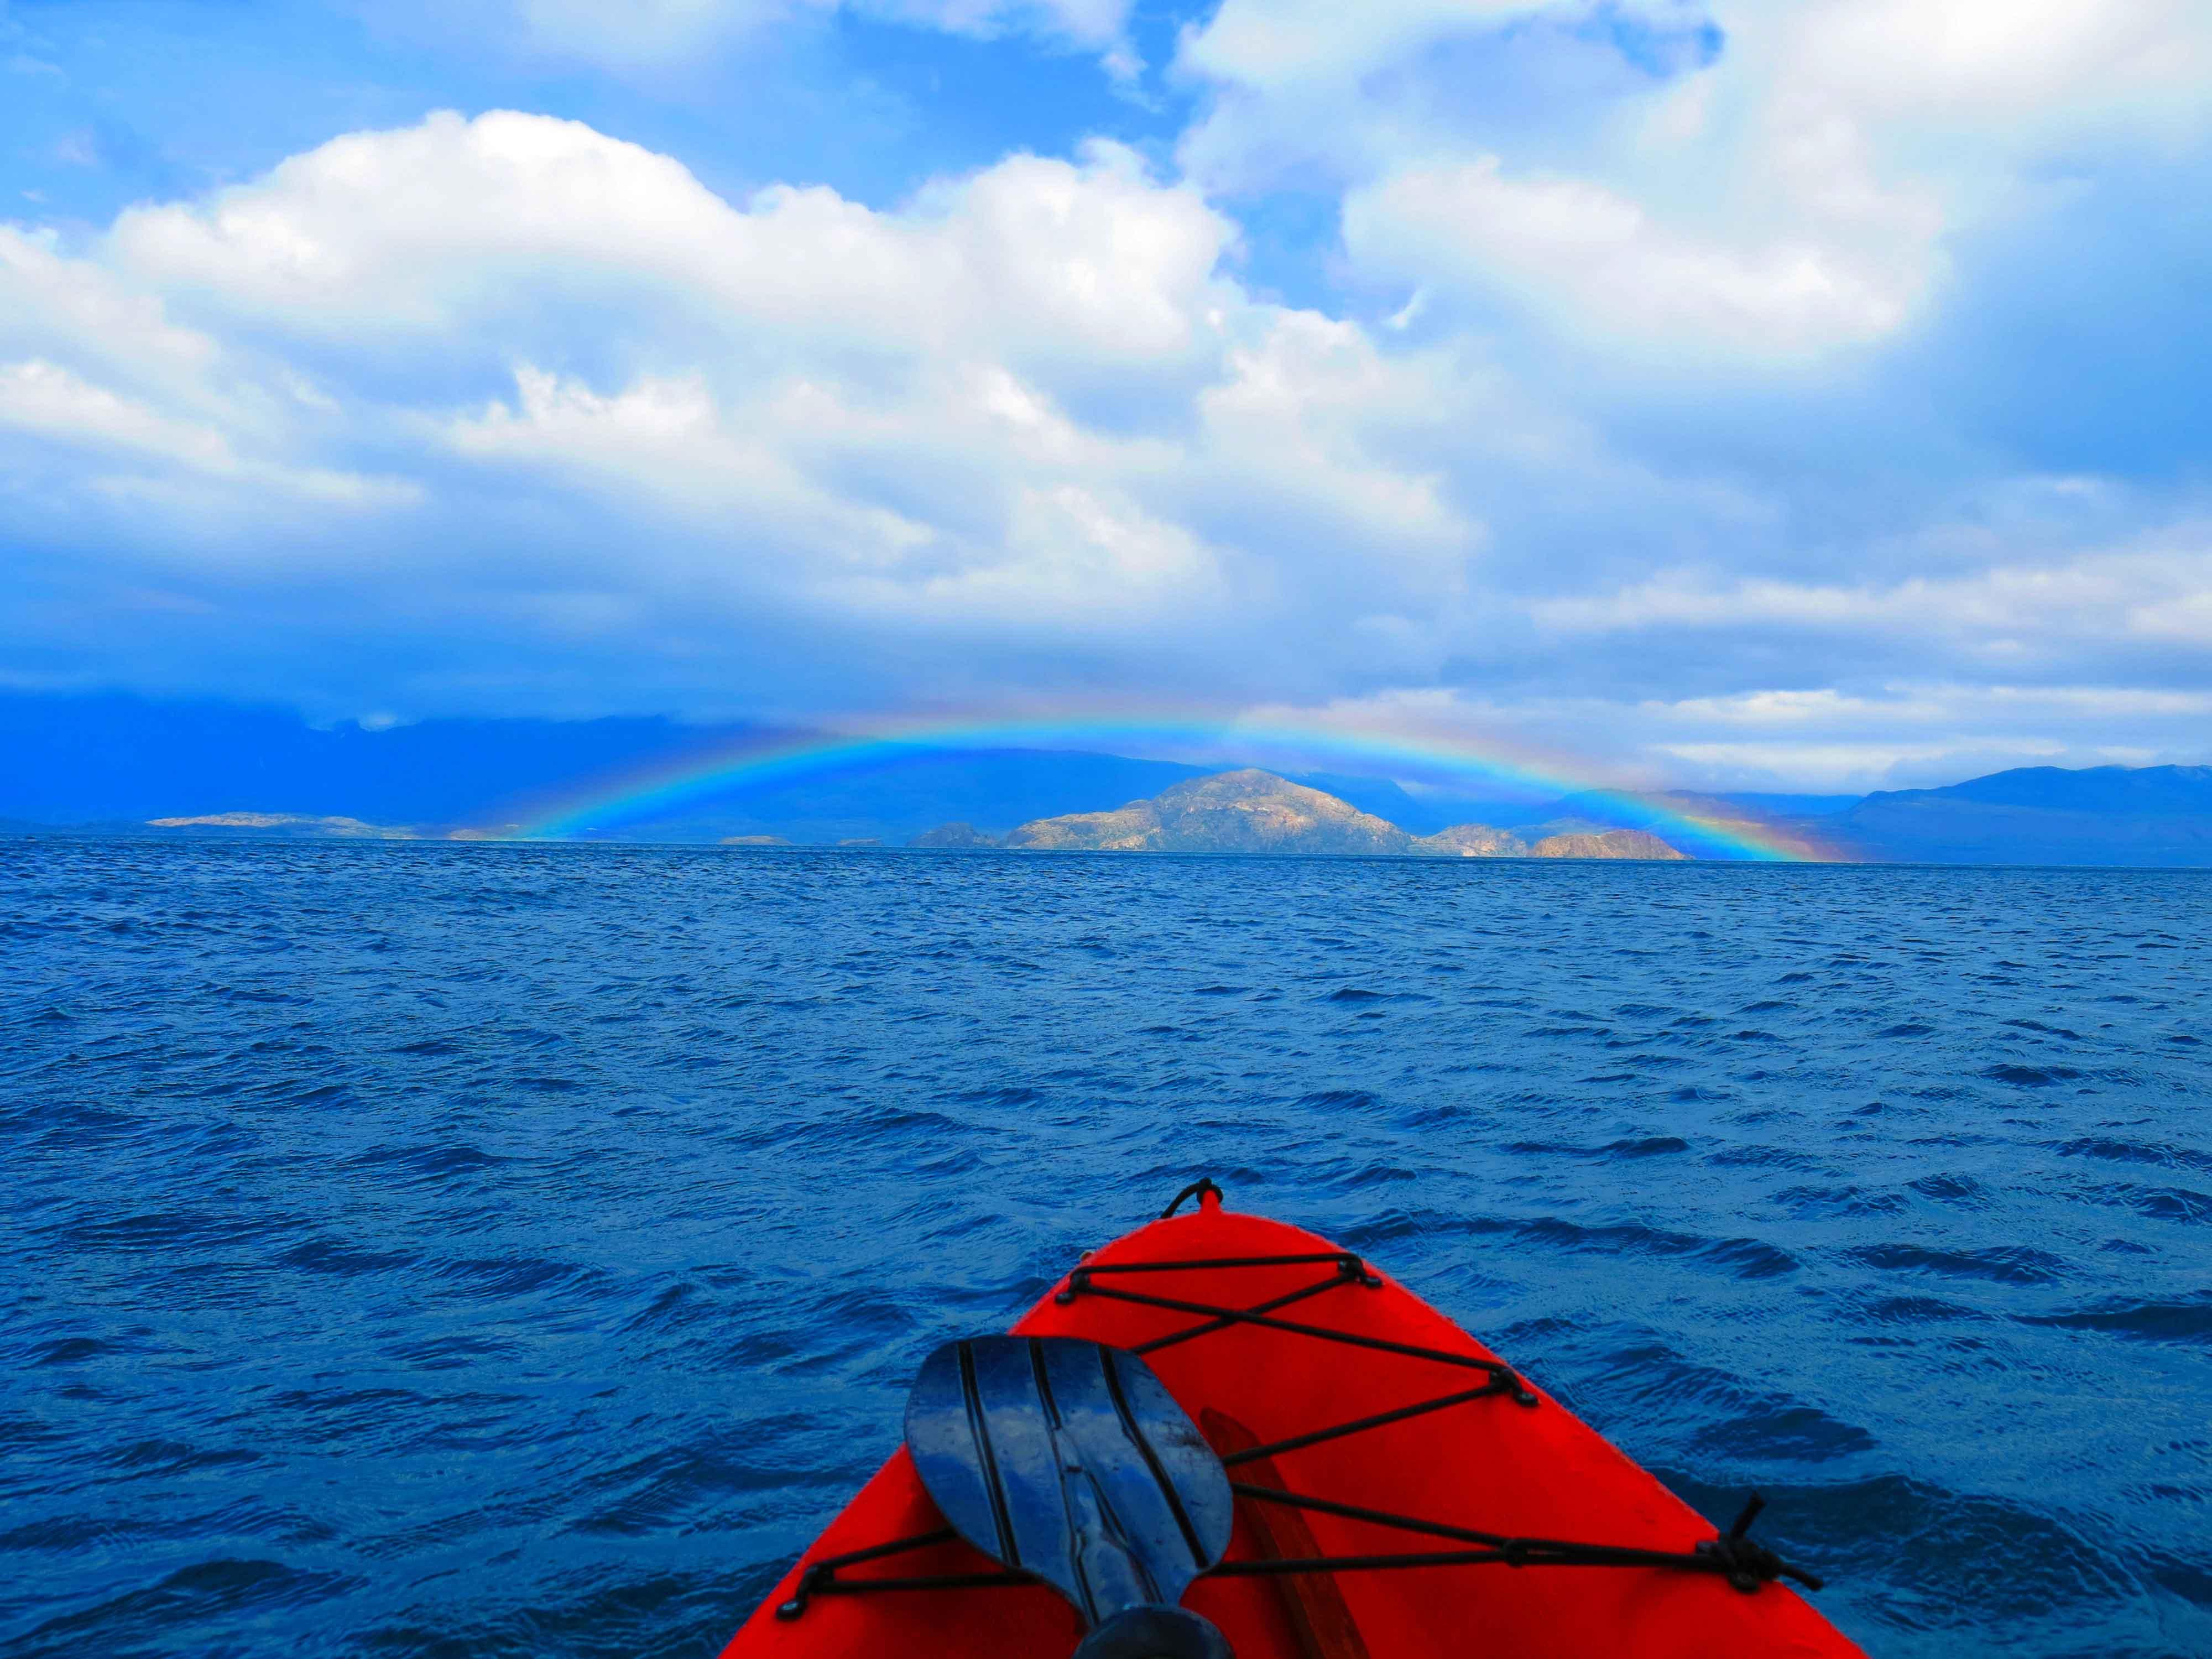 marble_caves_kayaking_rainbow